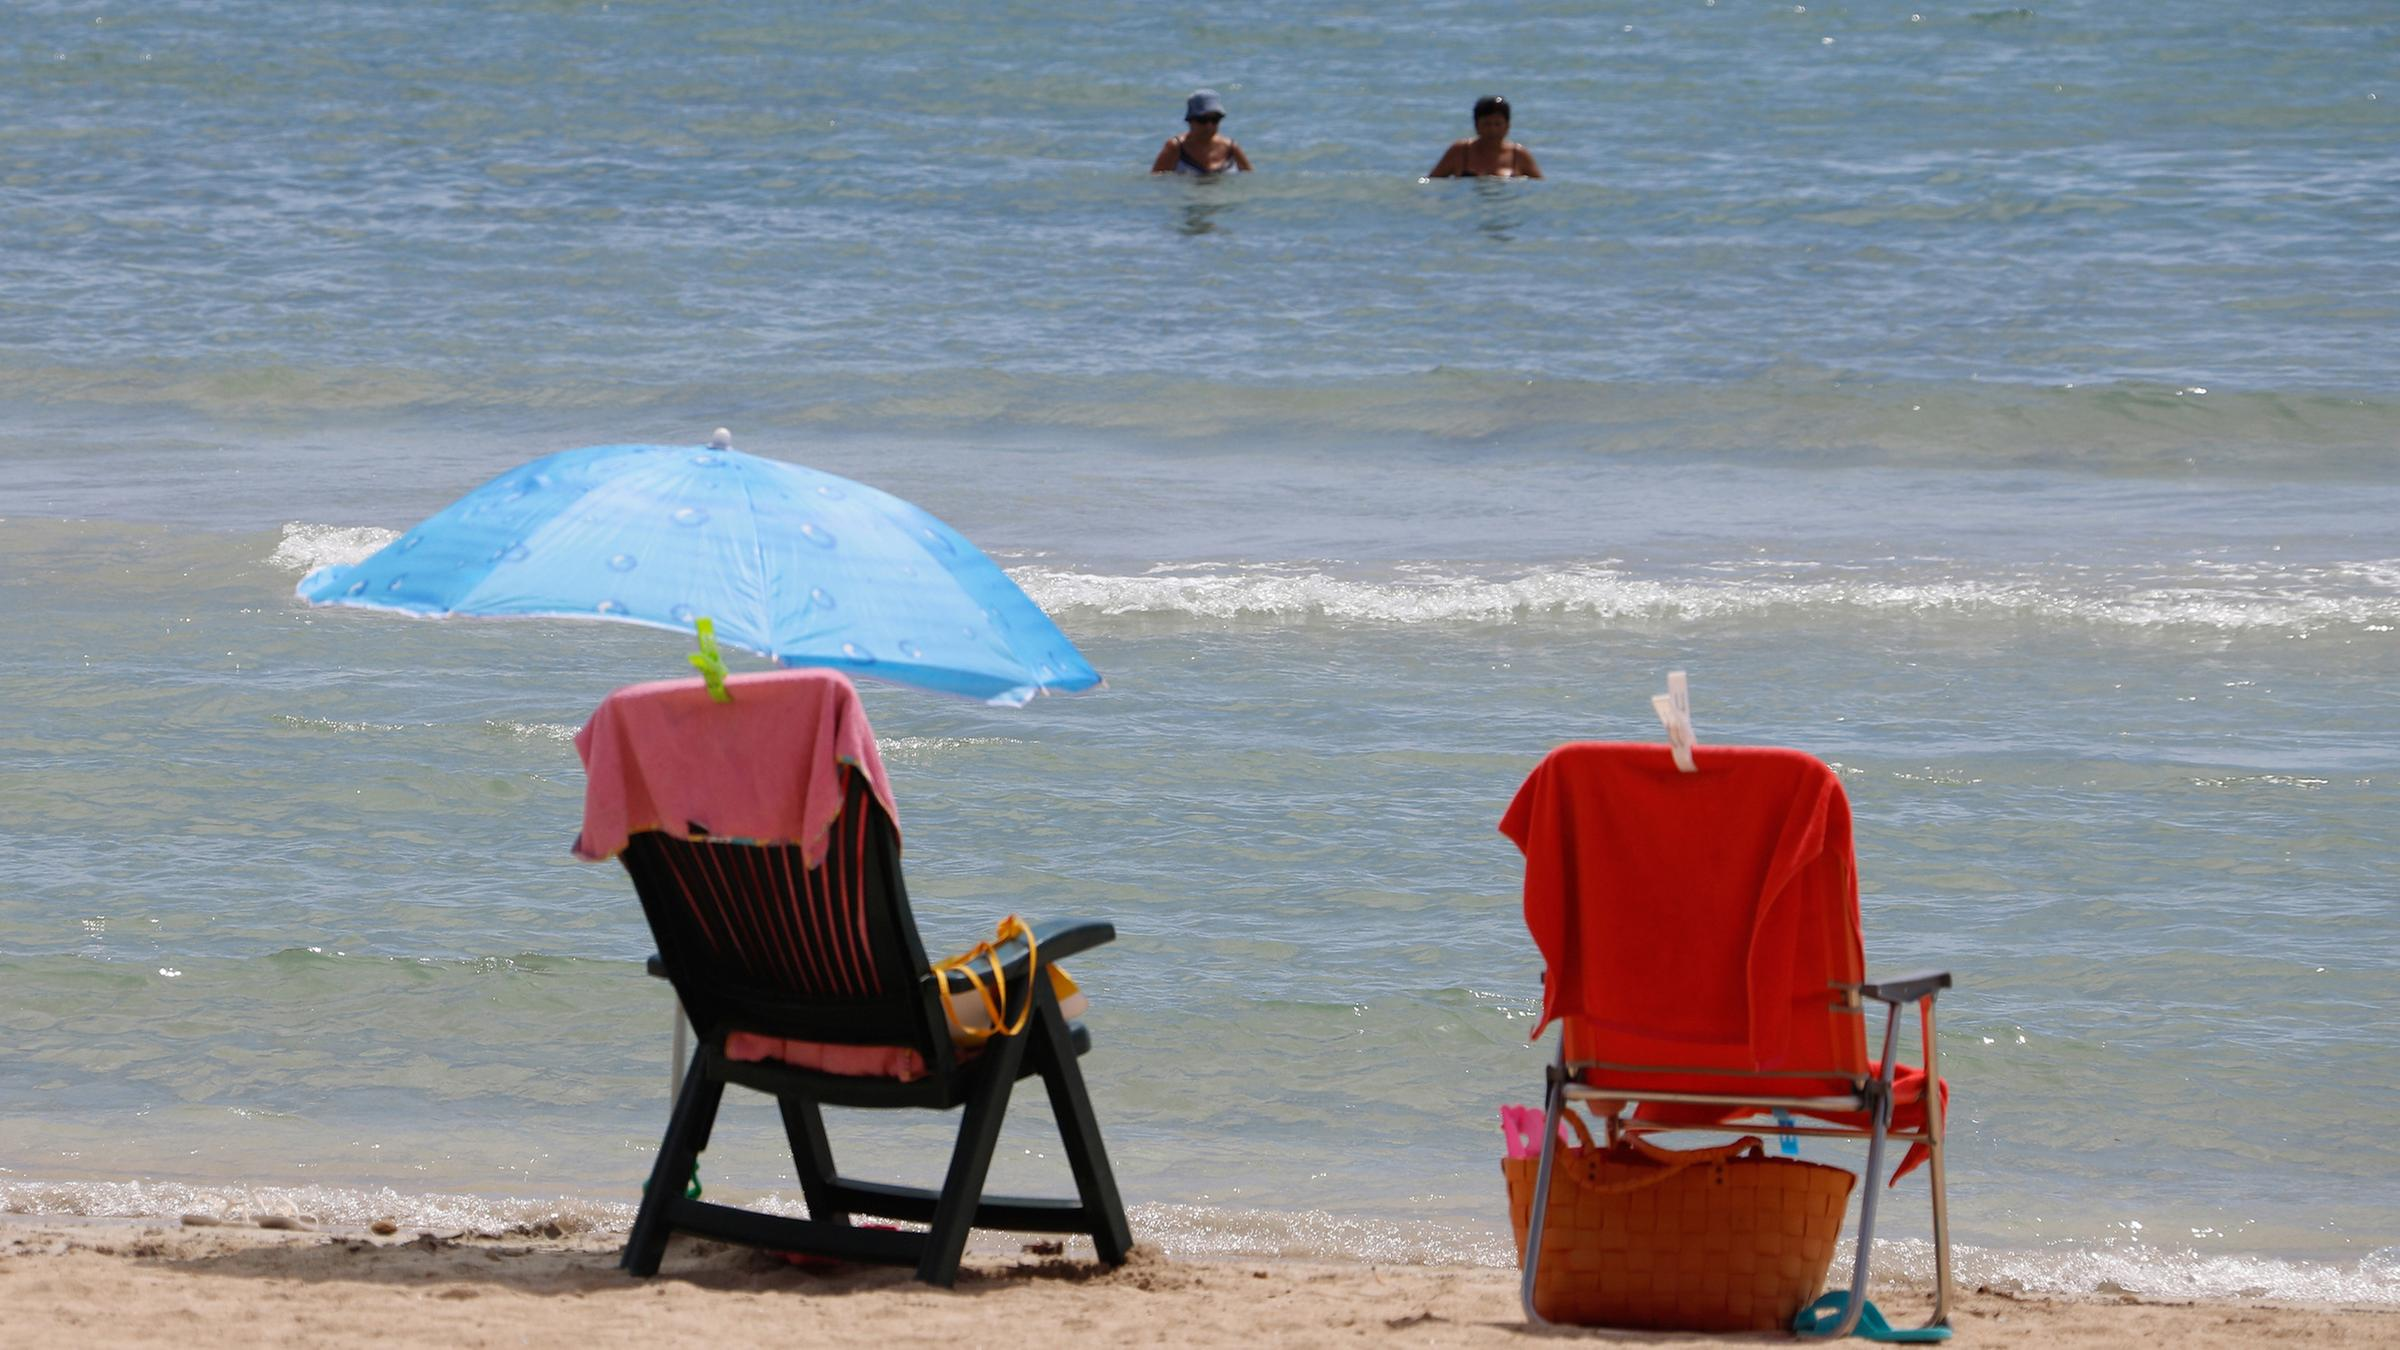 Spanien Wieder Corona Risikogebiet Folgen Fur Den Urlaub Zdfheute